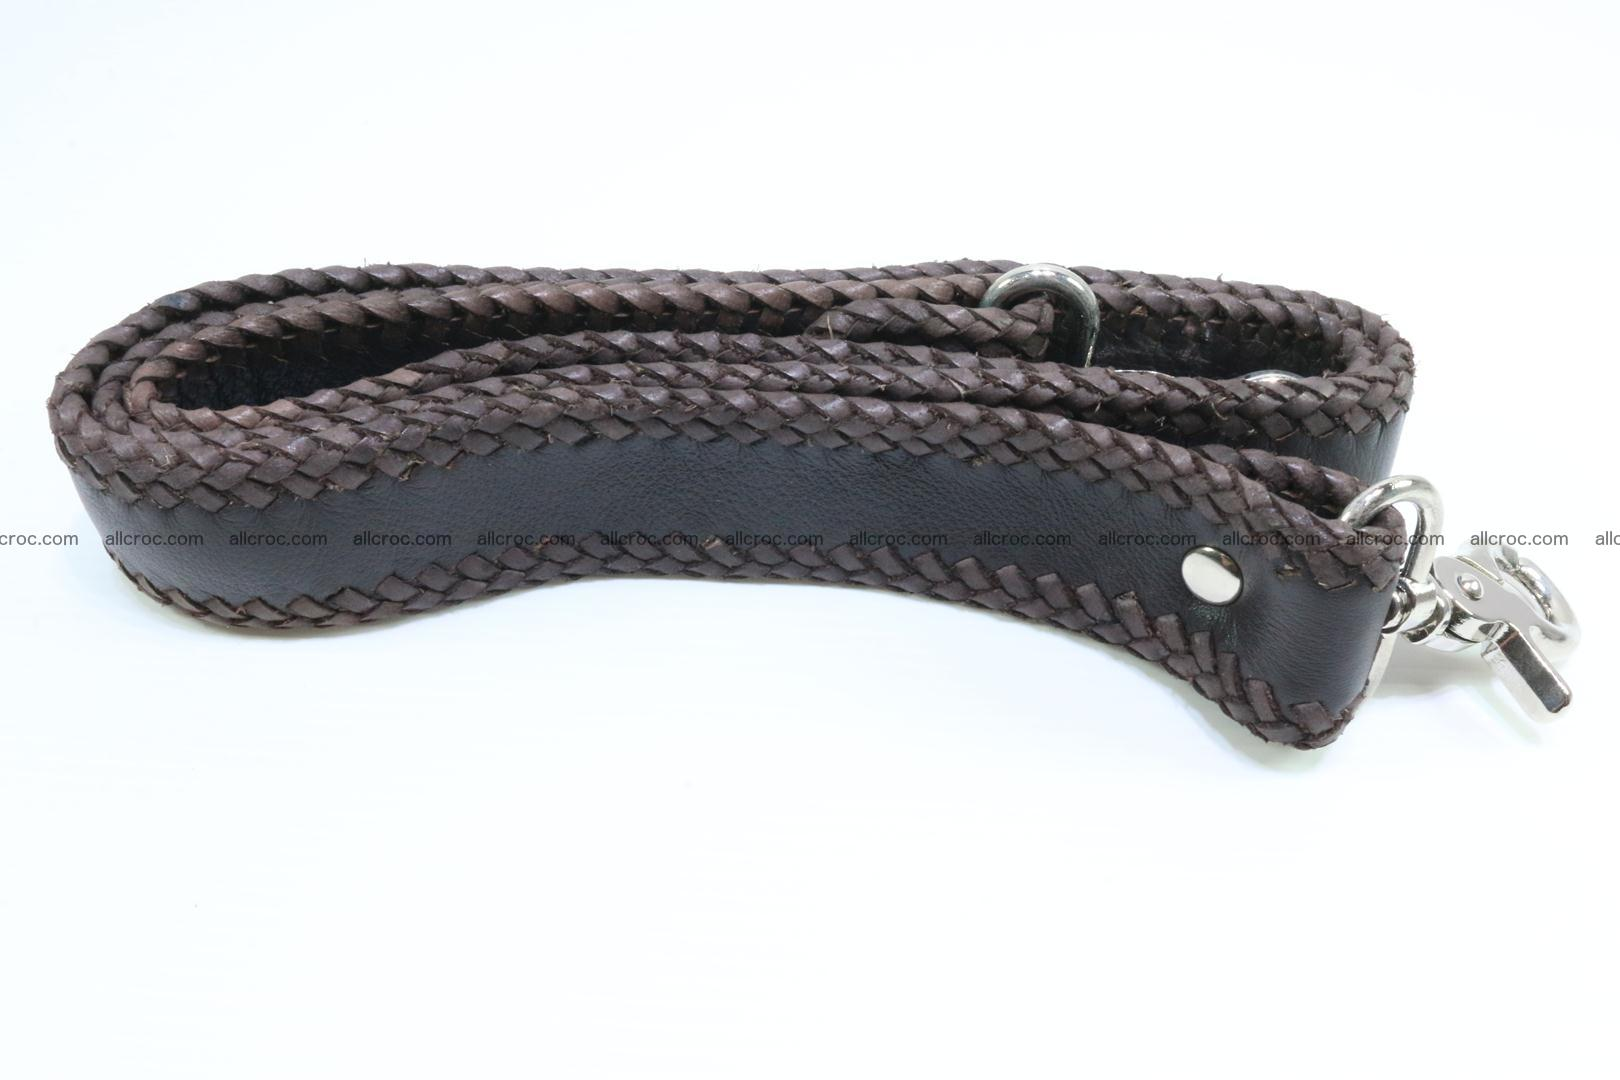 Crocodile skin messenger bag braided edges 421 Foto 17